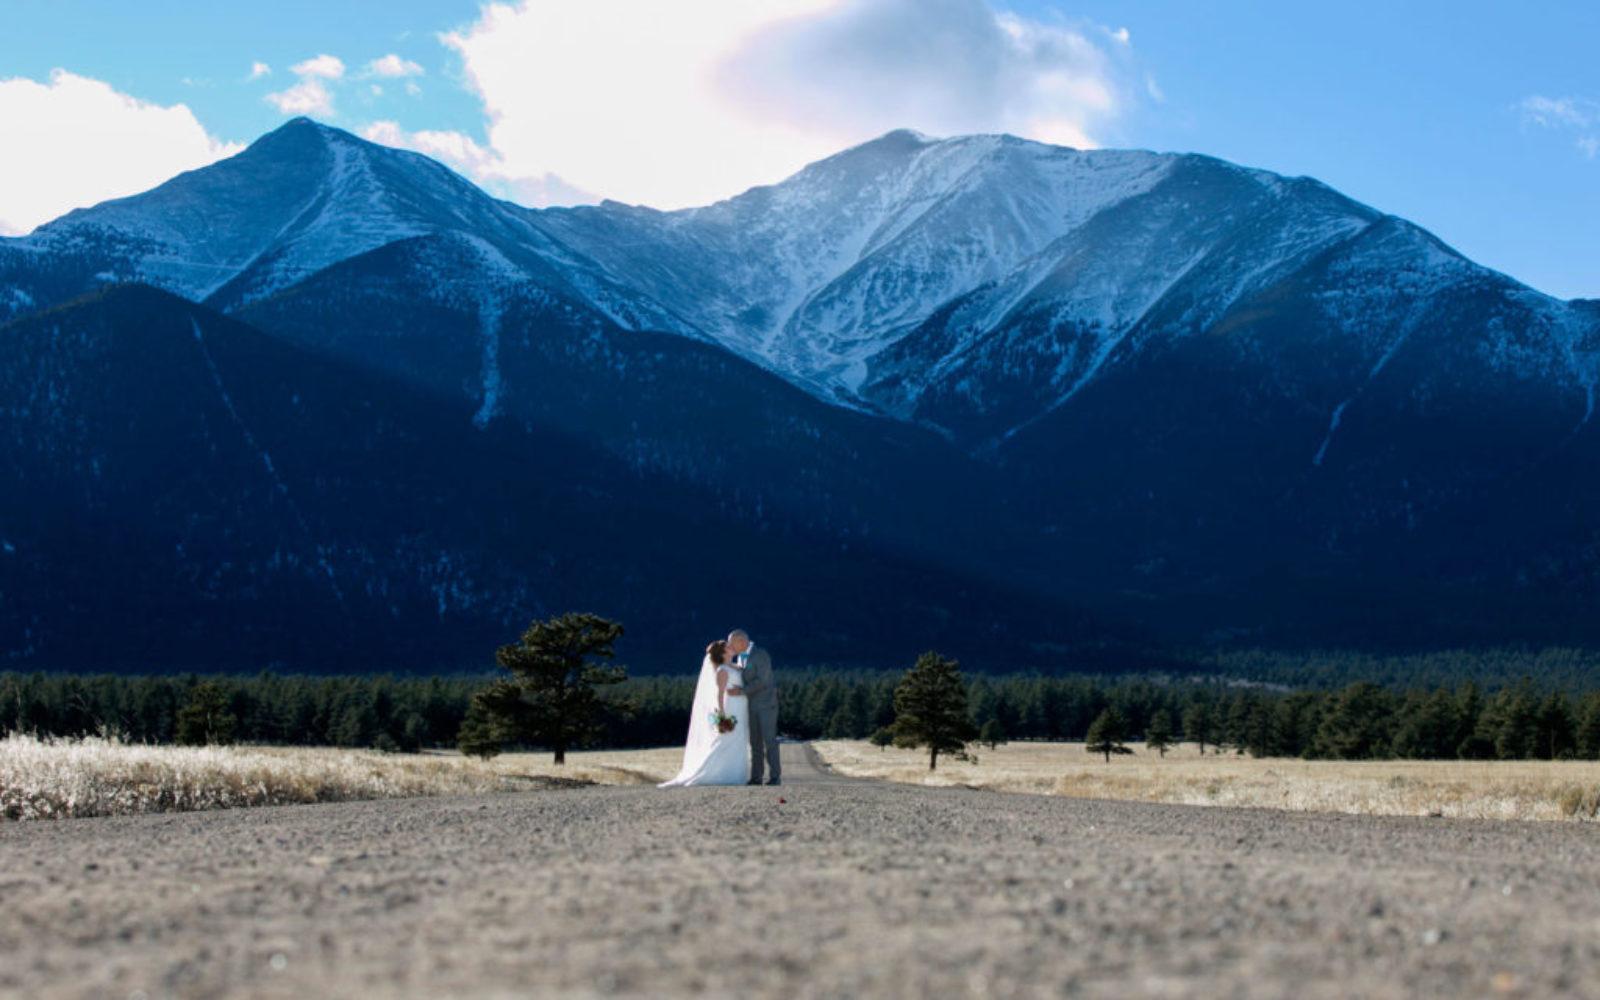 weddingphotographycoloradosprings_52-1024x640